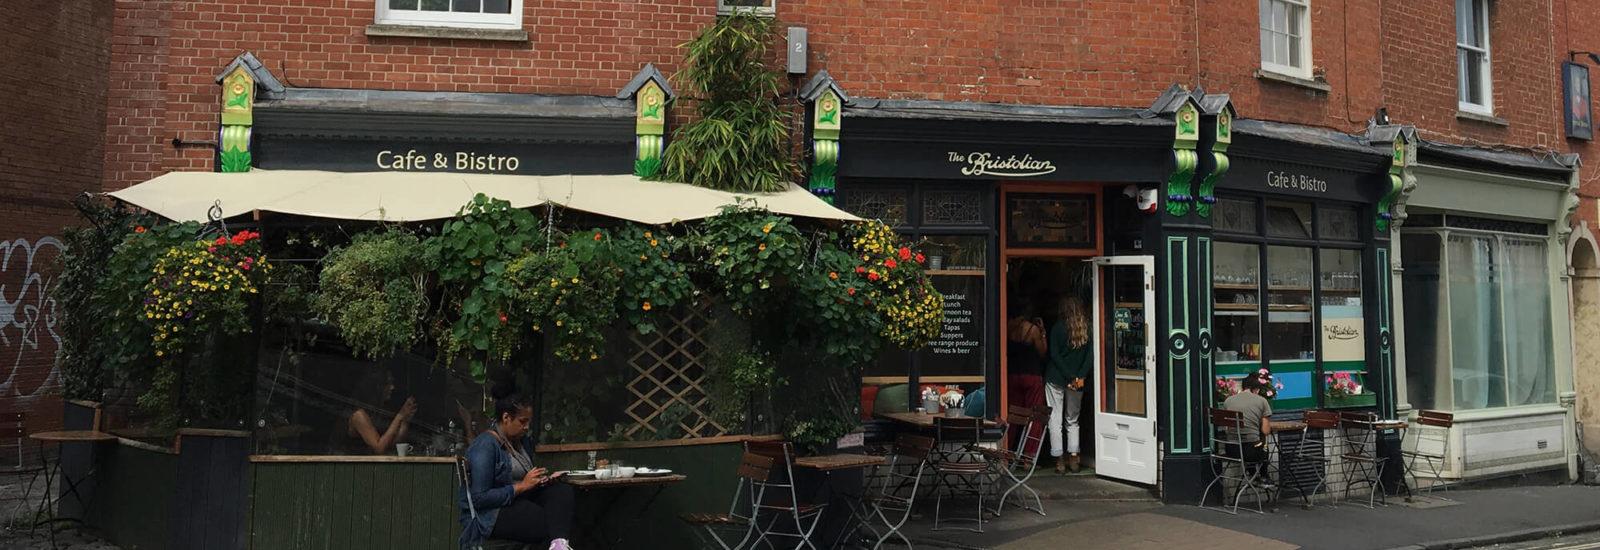 Image of The Bristolian Café